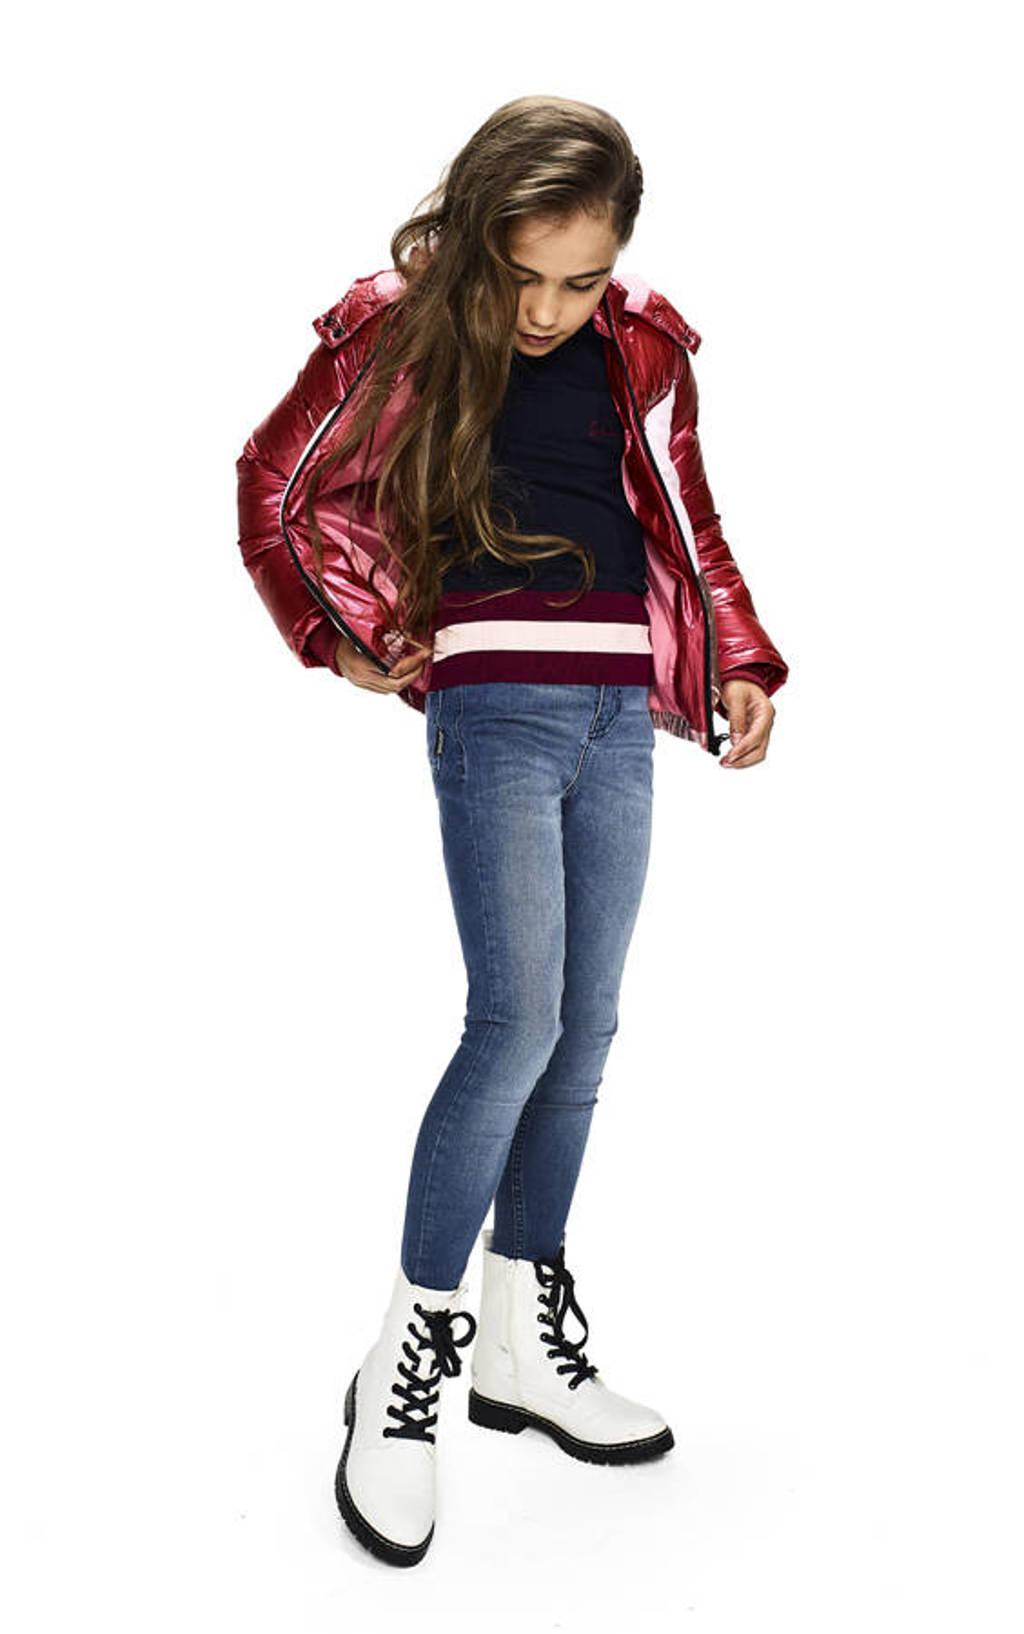 Retour Denim gewatteerde winterjas Joy rood/roze/rosé, Rood/roze/rosé